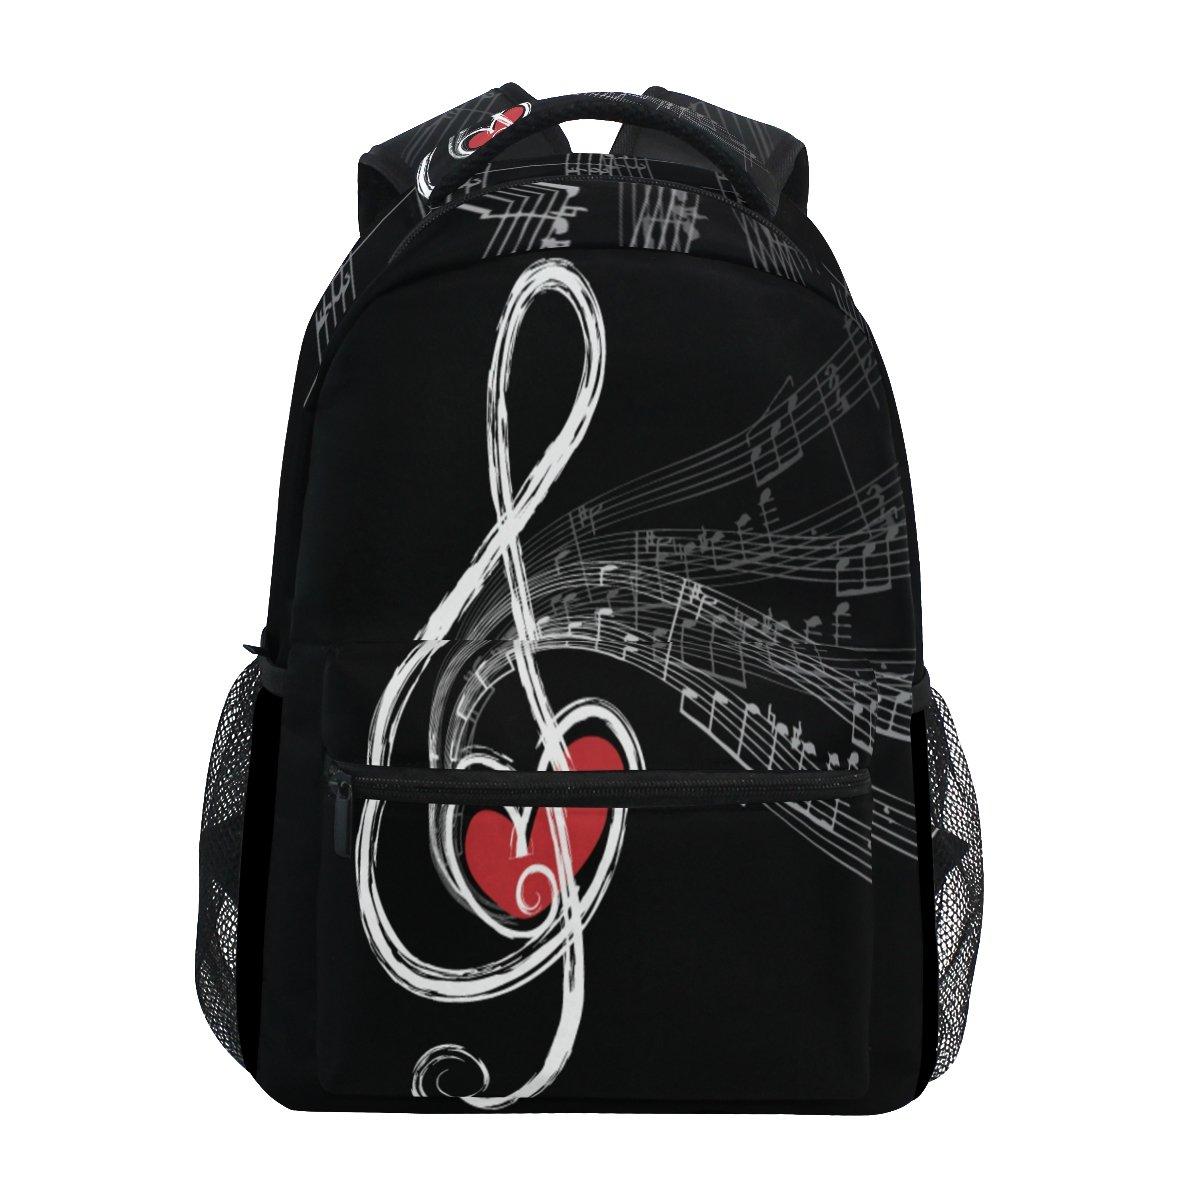 TropicalLife Valentines Love Heart Music Notes Backpacks School Bookbag Shoulder Backpack Hiking Travel Daypack Casual Bags